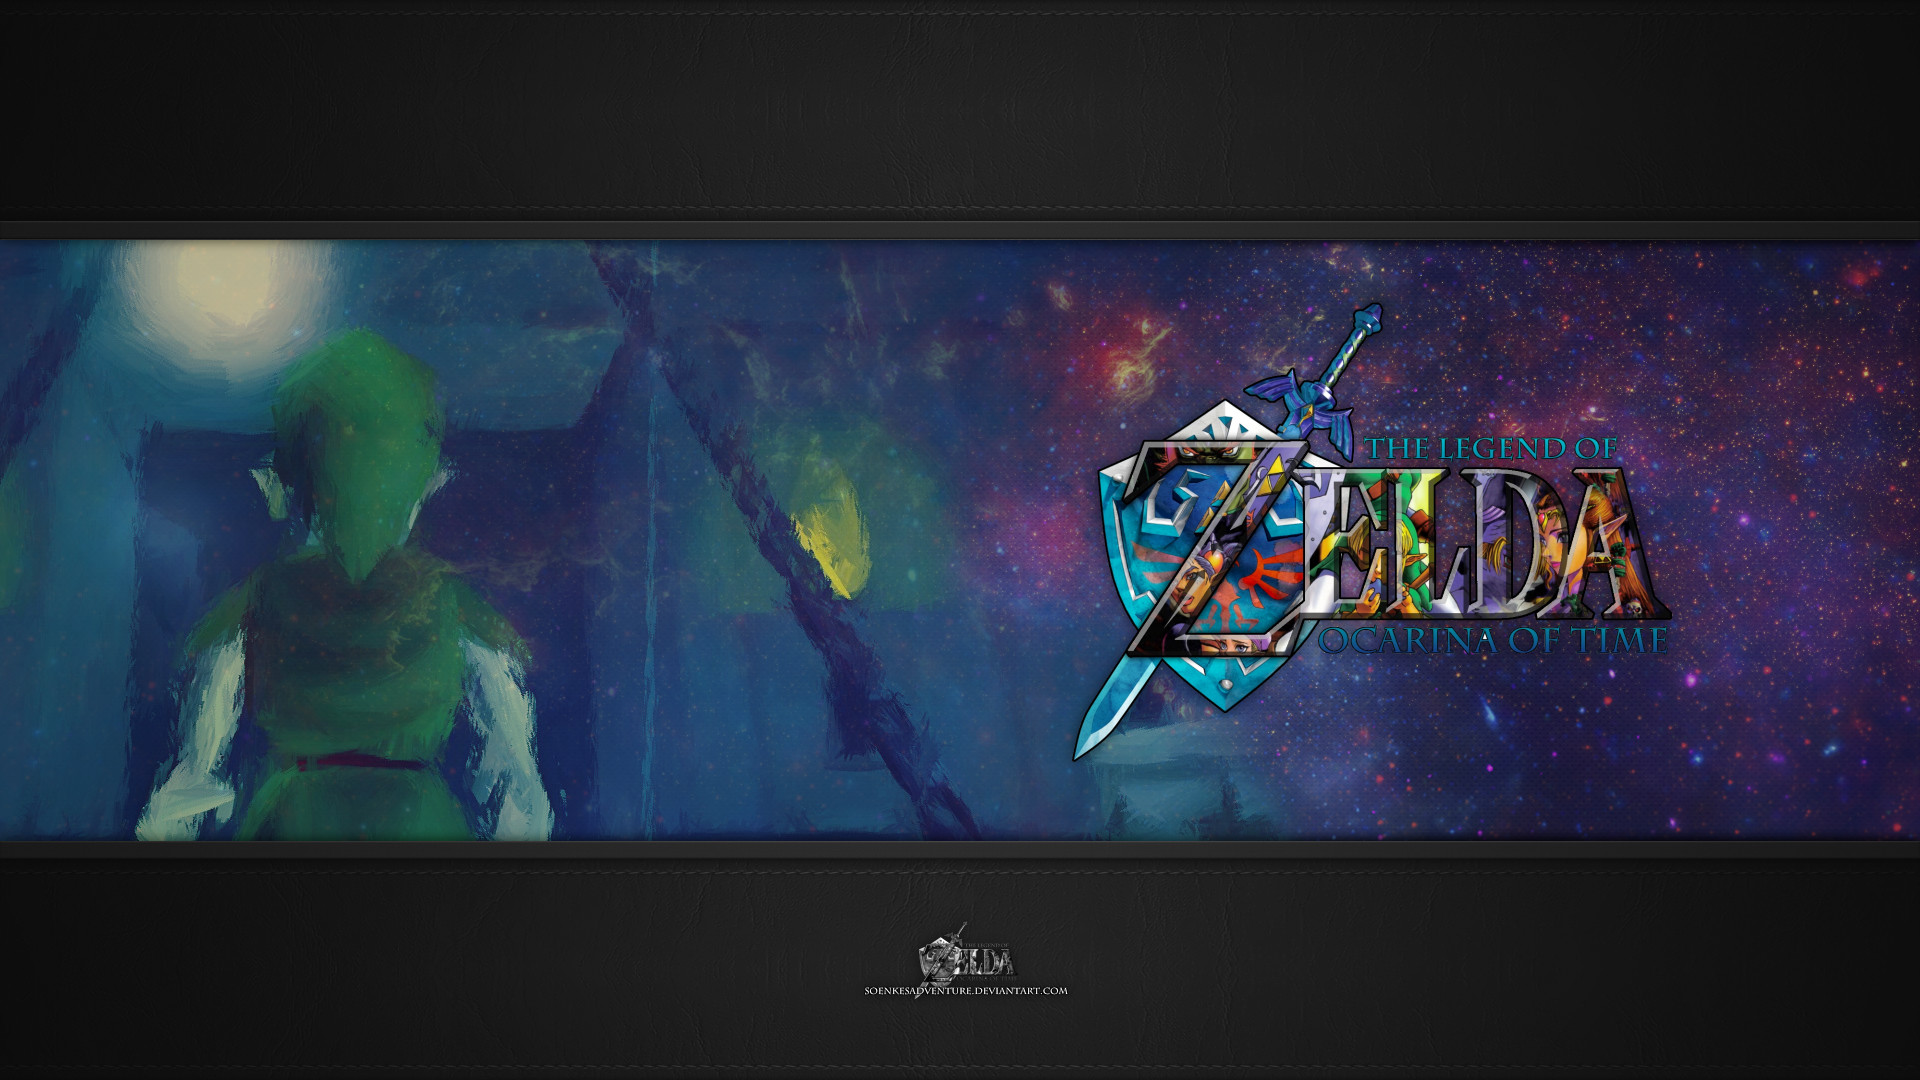 … SoenkesAdventure Zelda – Ocarina of Time Wallpaper Full HD 1080p by  SoenkesAdventure